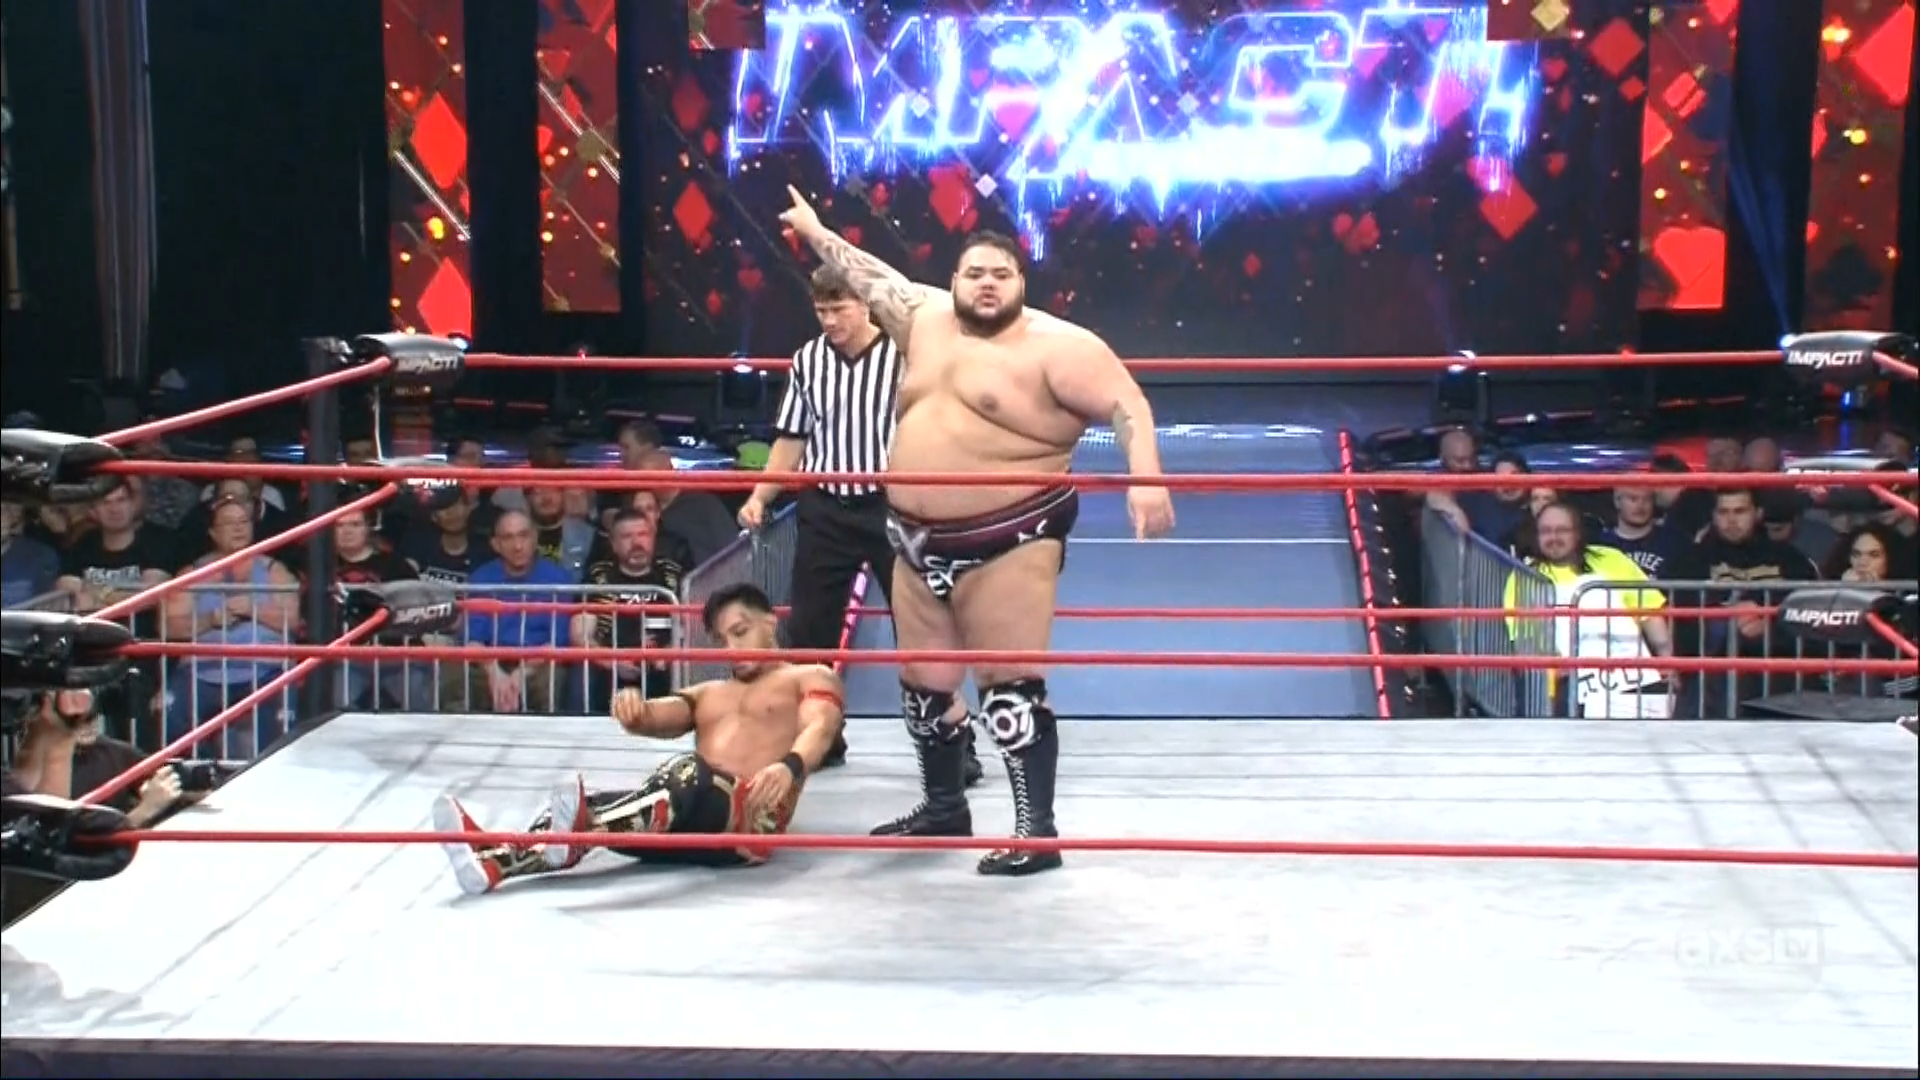 iMPACT Wrestling 2020 03 24 1080i HDTV -WH [13 GB]